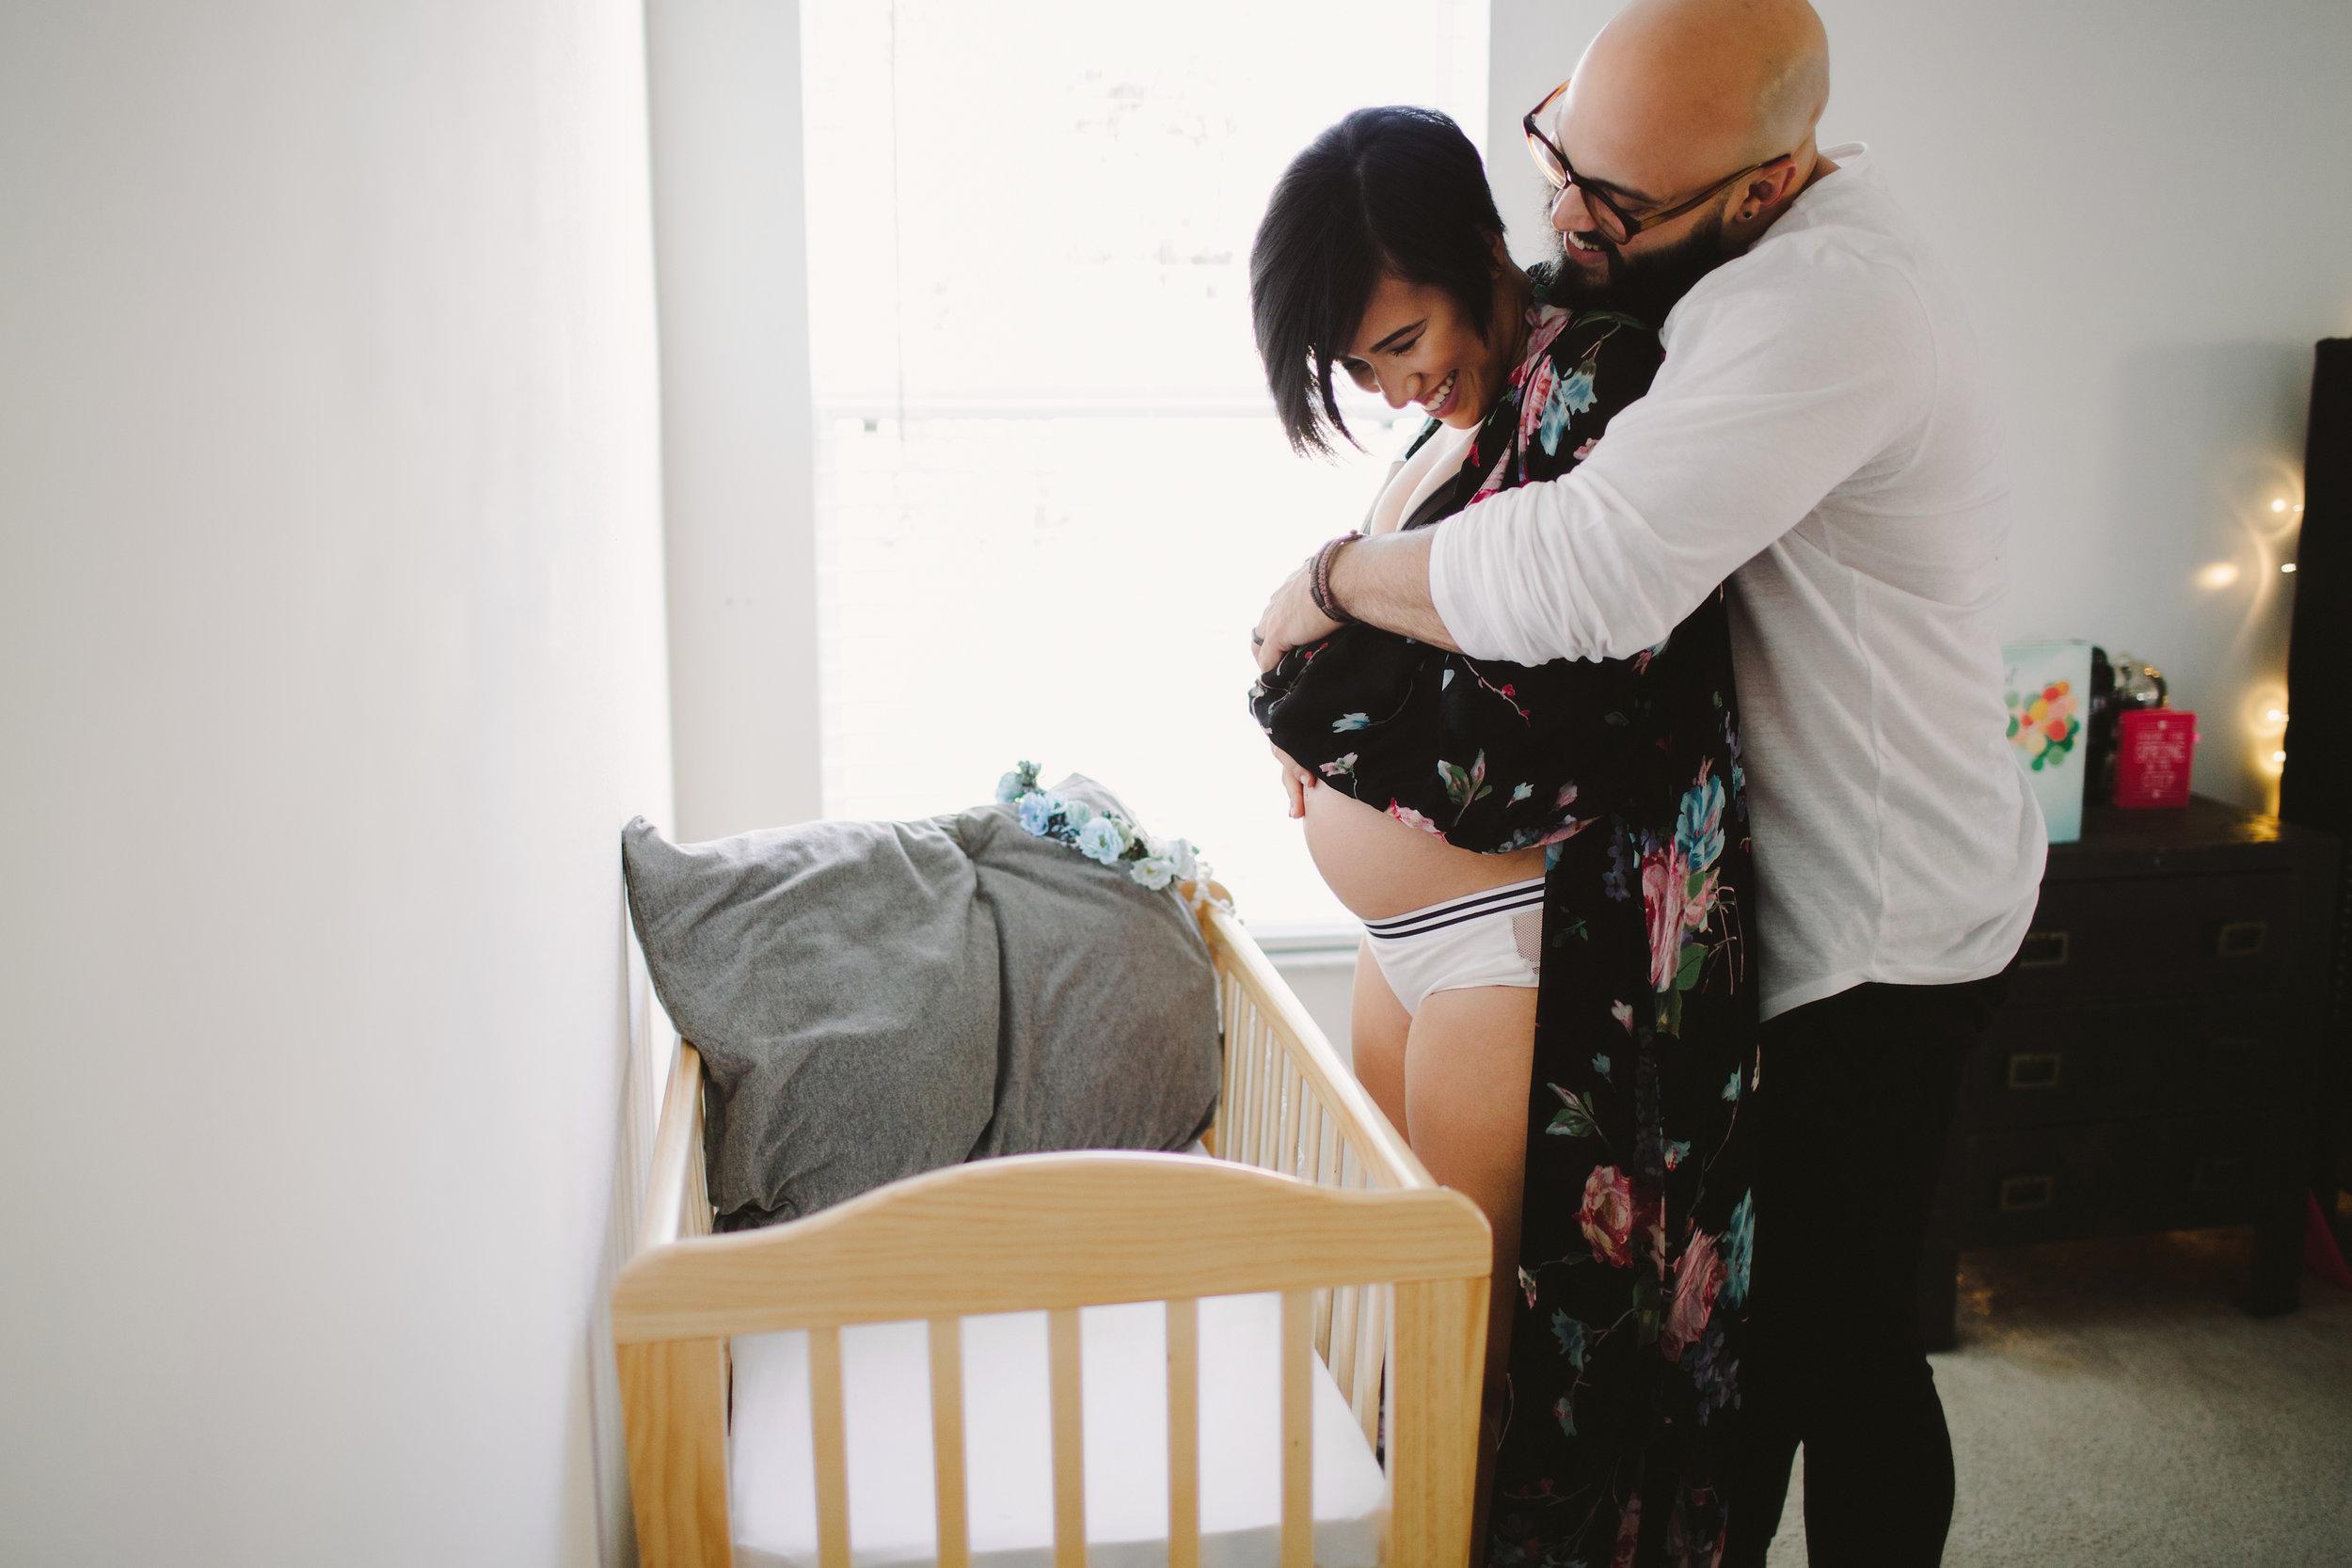 Indoor Lifestlye Maternity Session | Vanessa Boy | Vanessaboy.com |orlando,fl-395.com |final.jpg